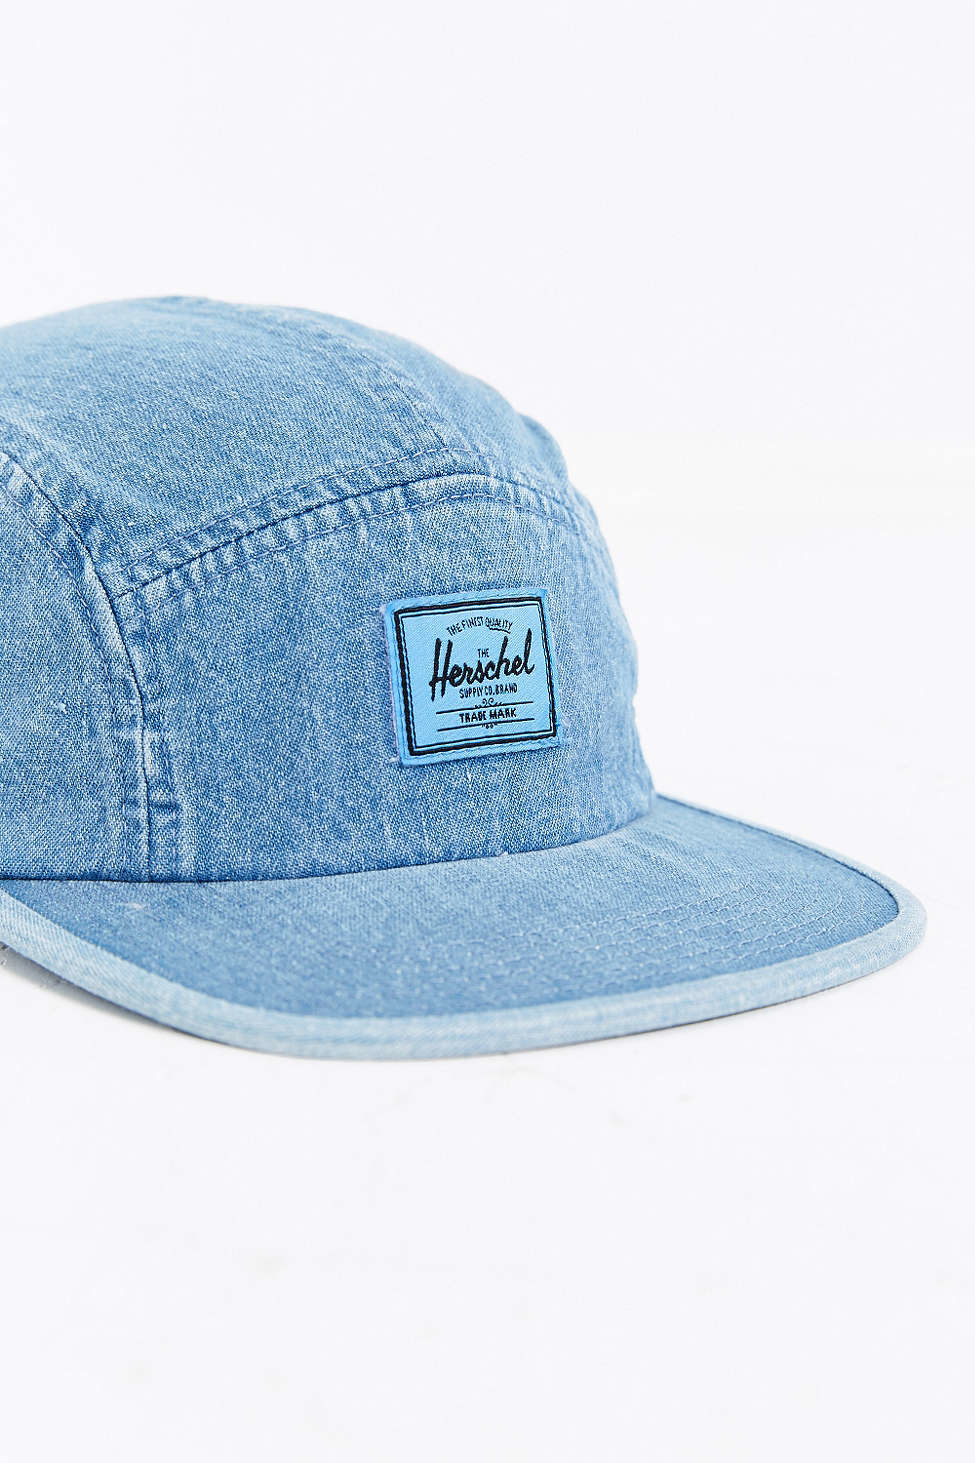 1c5e5c99063 Lyst - Herschel Supply Co. 5-panel Baseball Hat in Blue for Men